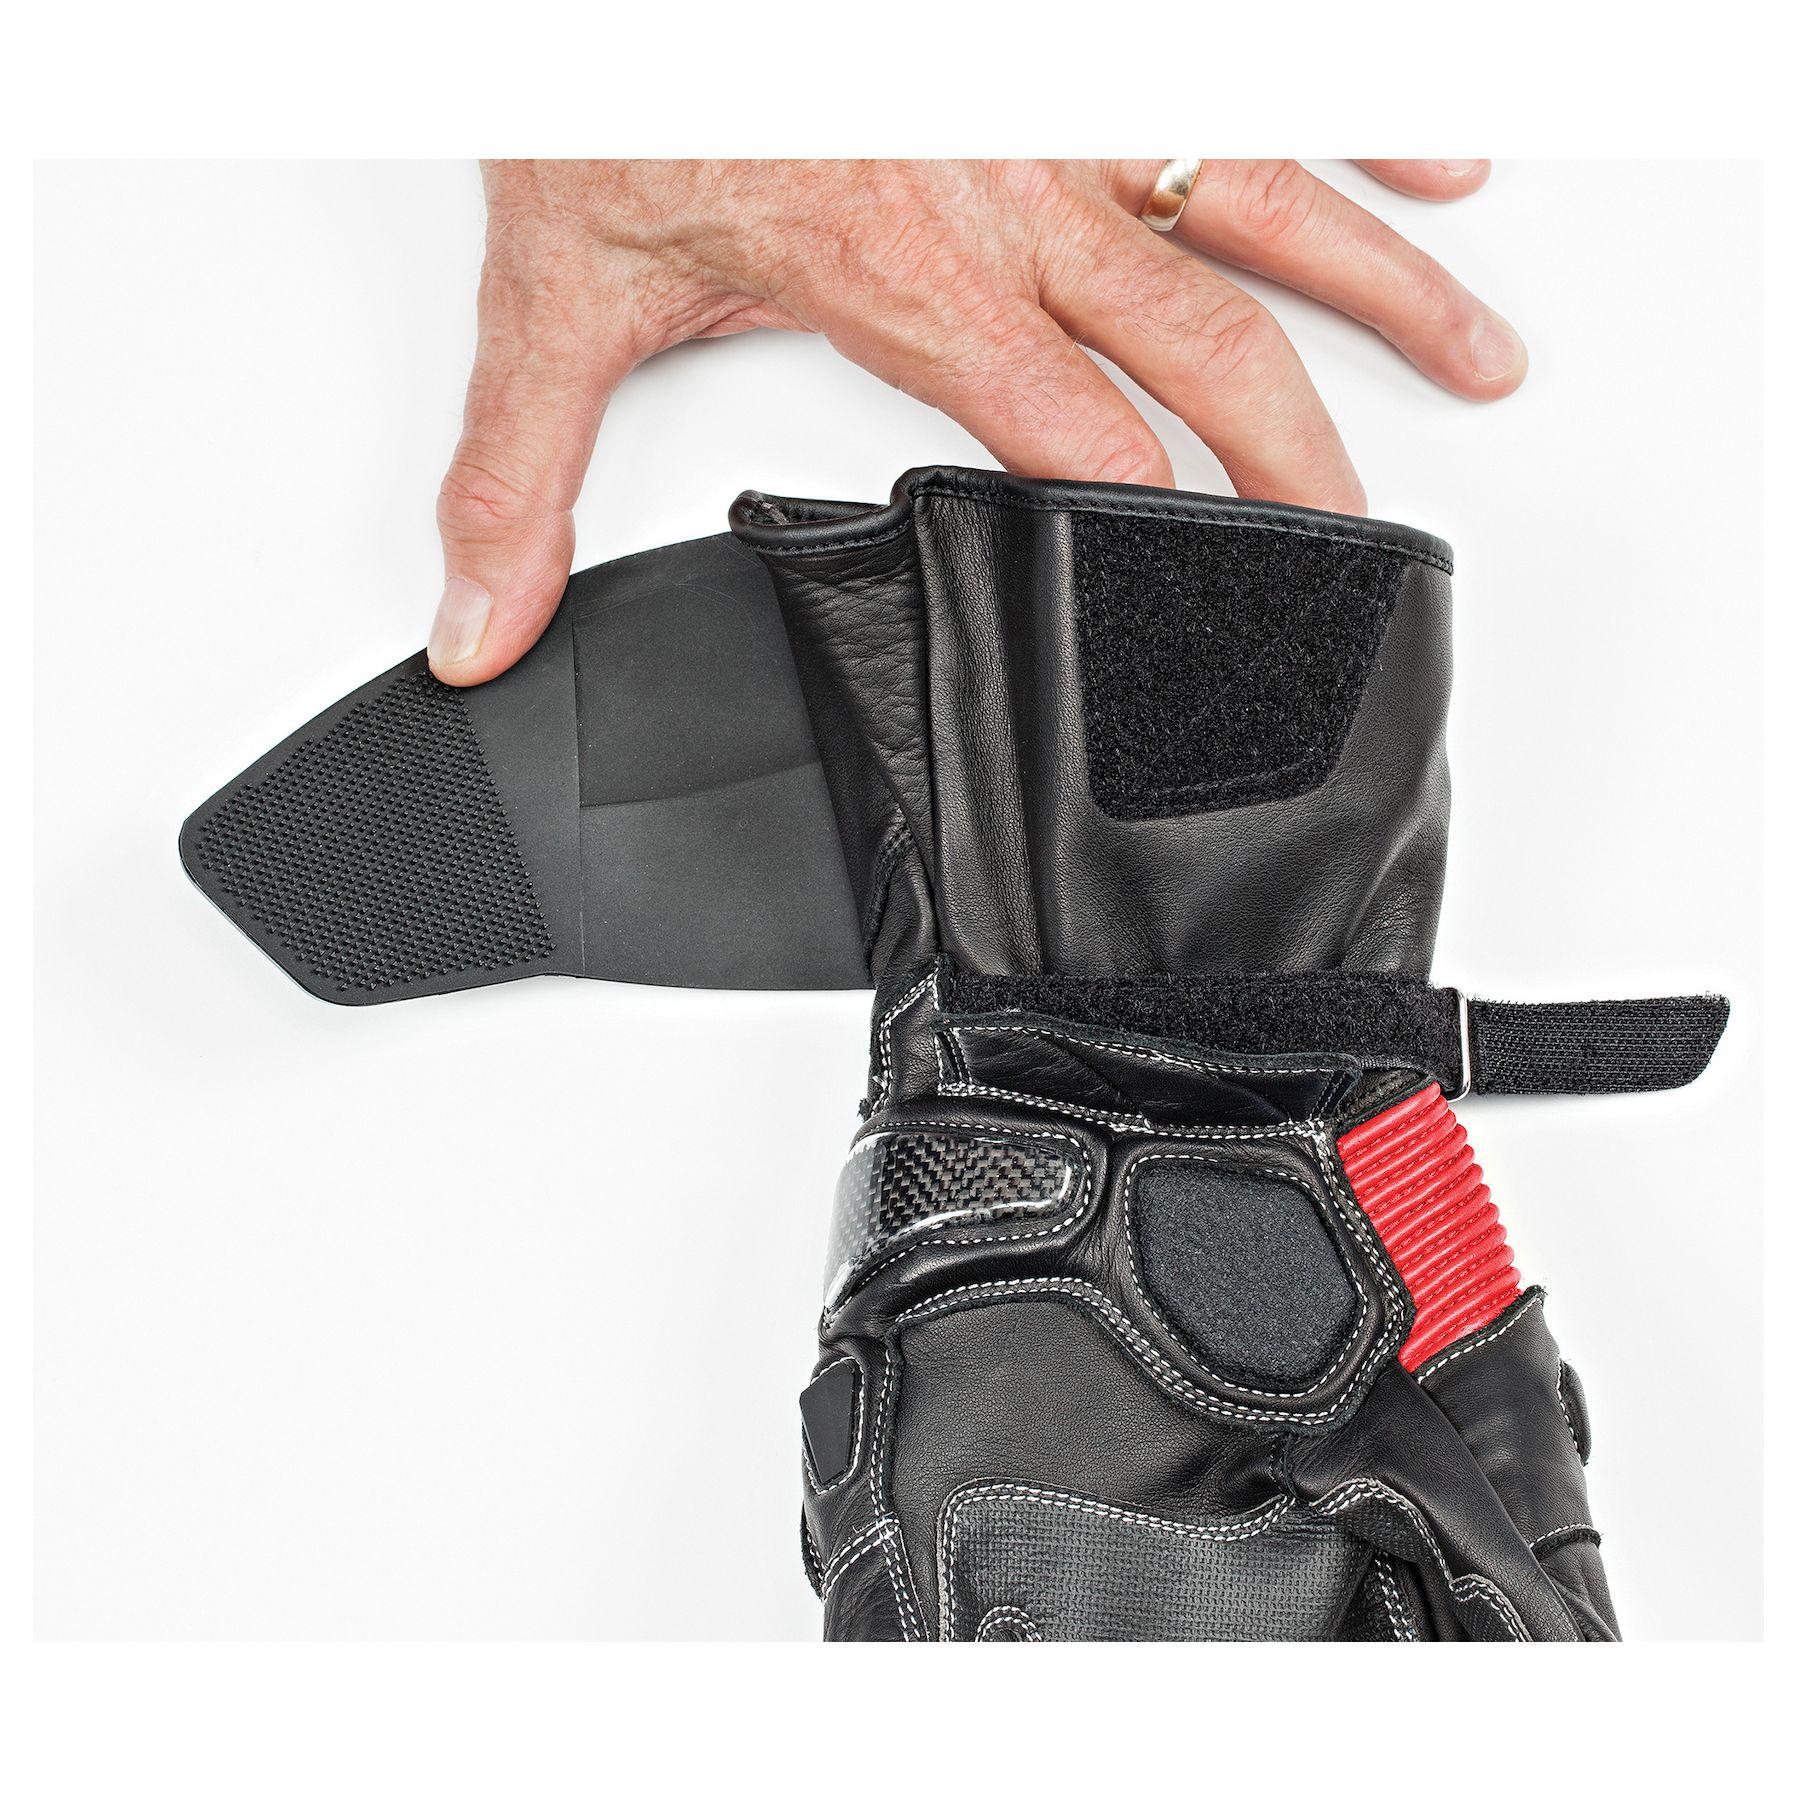 joe_rocket_gpx_gloves_black_red_1800x1800.jpg